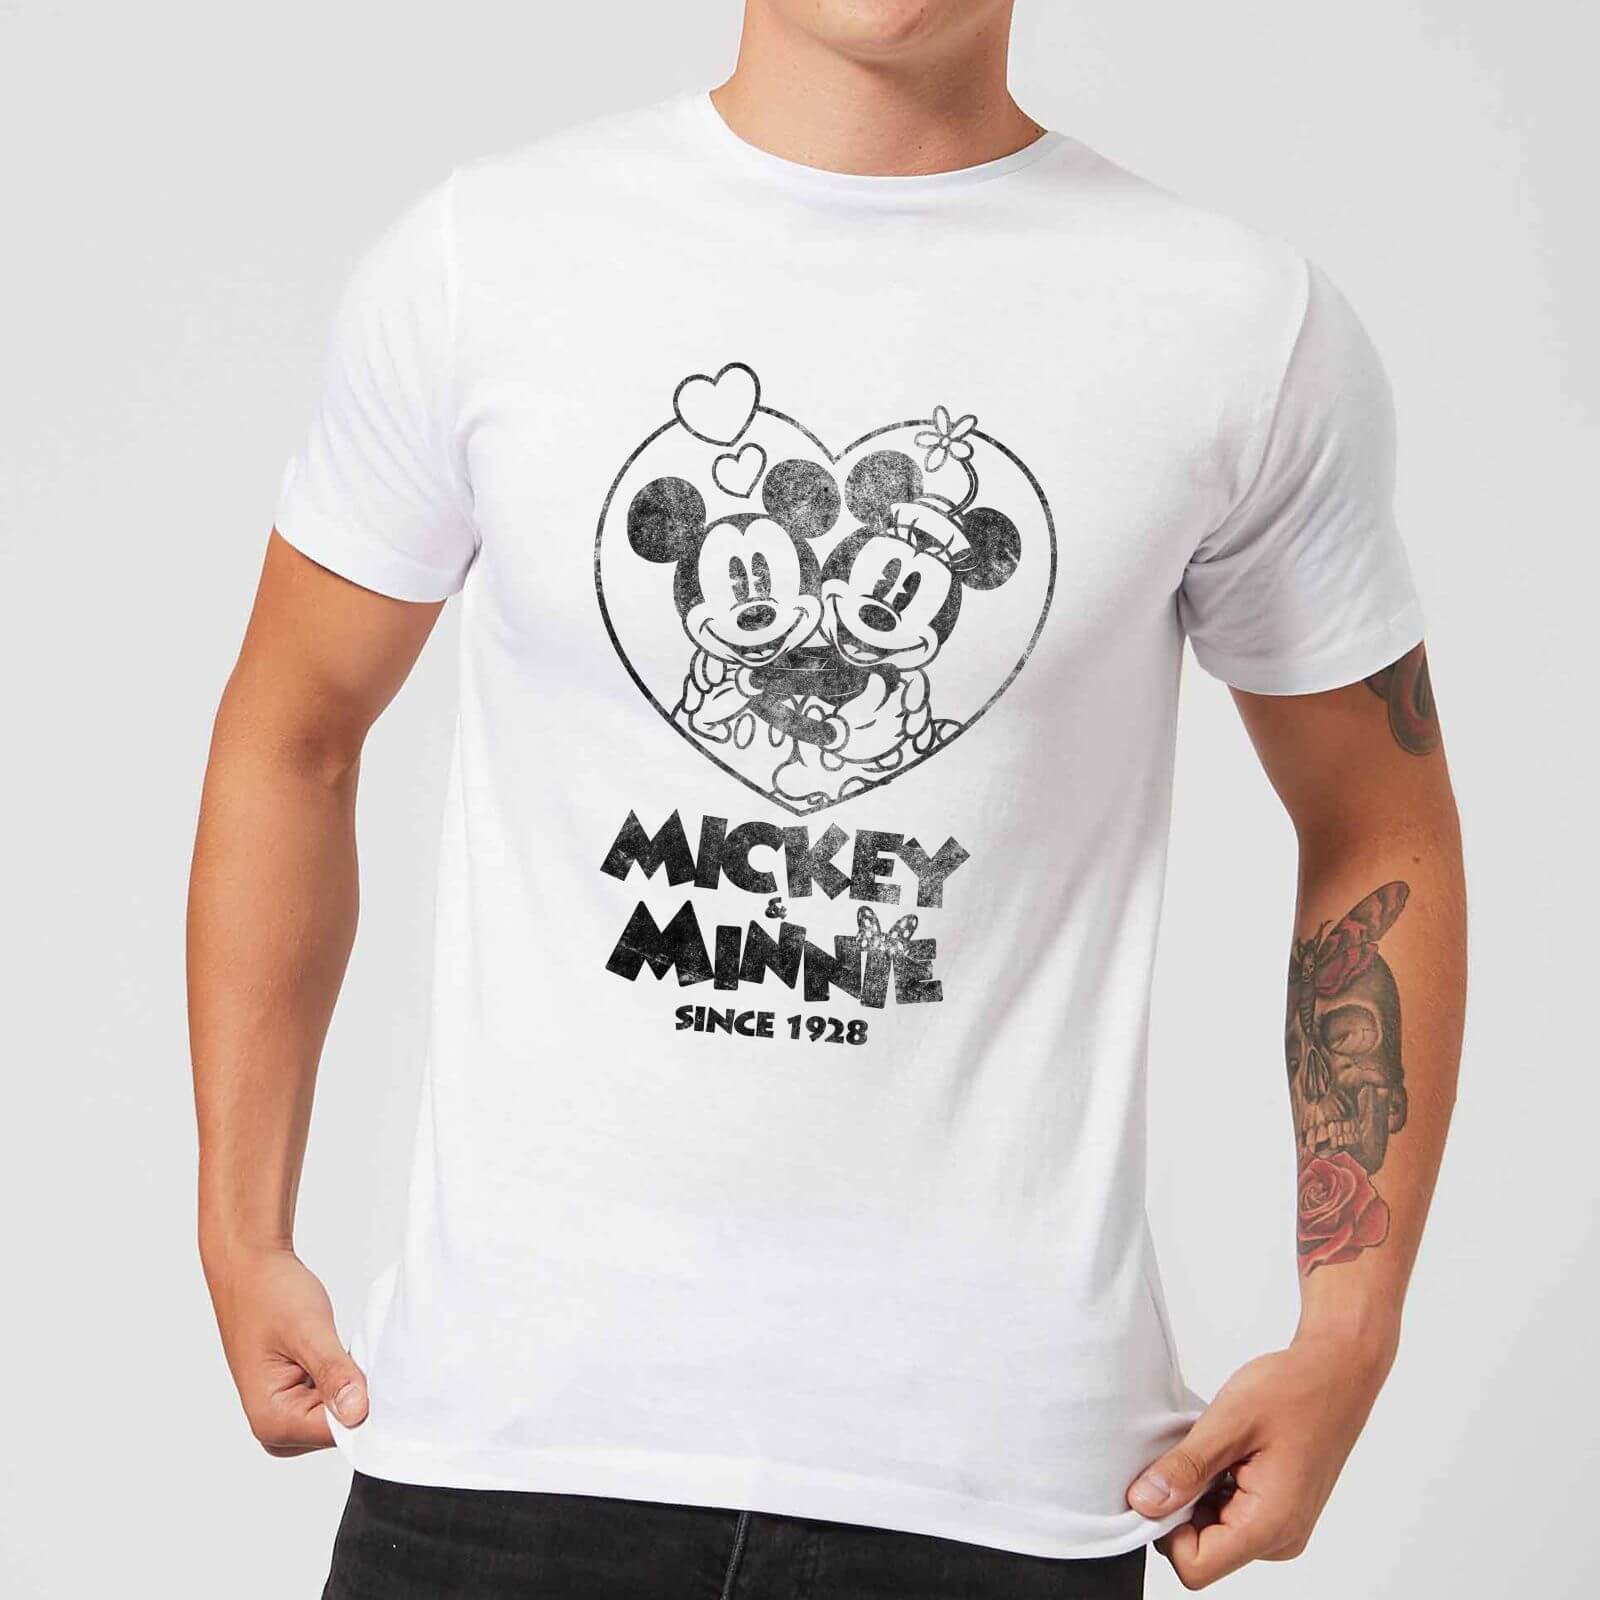 Disney Disney Minnie Mickey Since 1928 T-Shirt - White - 5XL - White